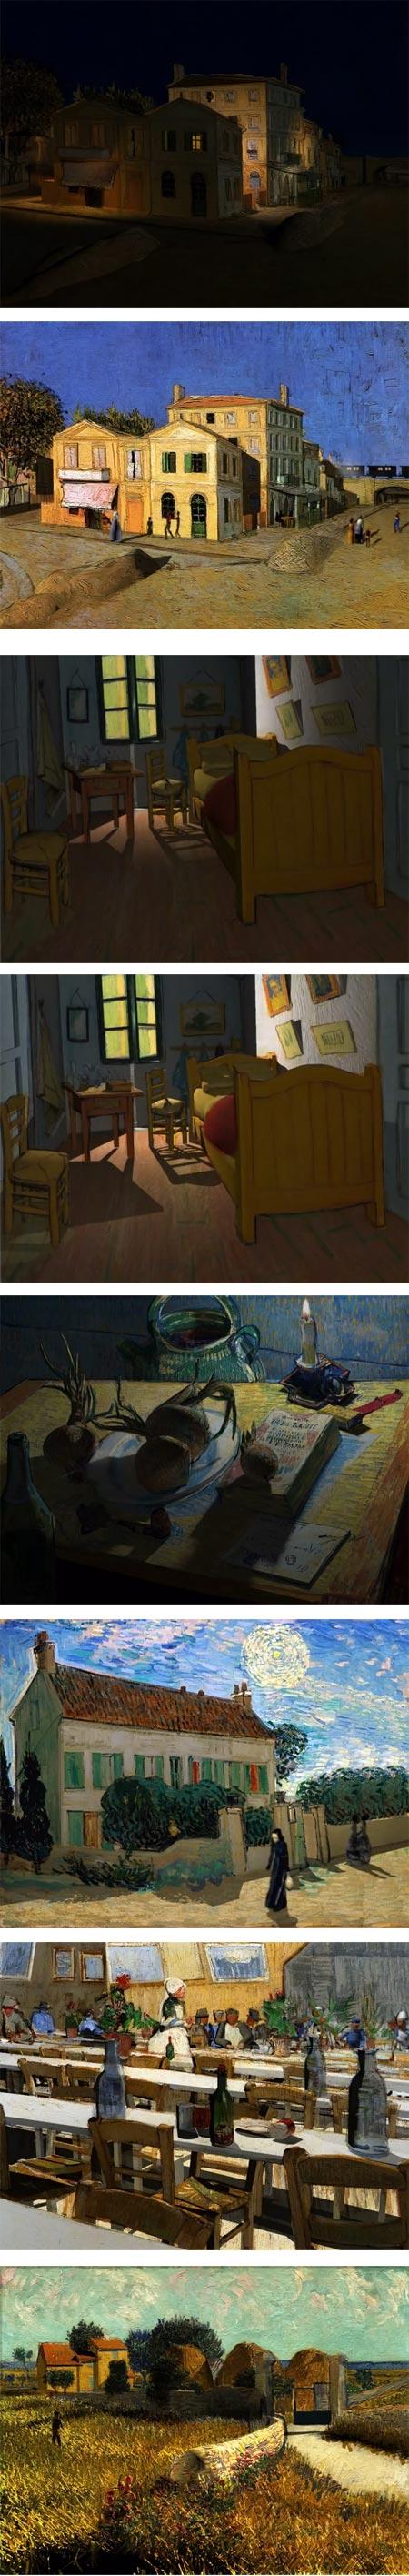 Van Gogh Shadow, Luca Agnani